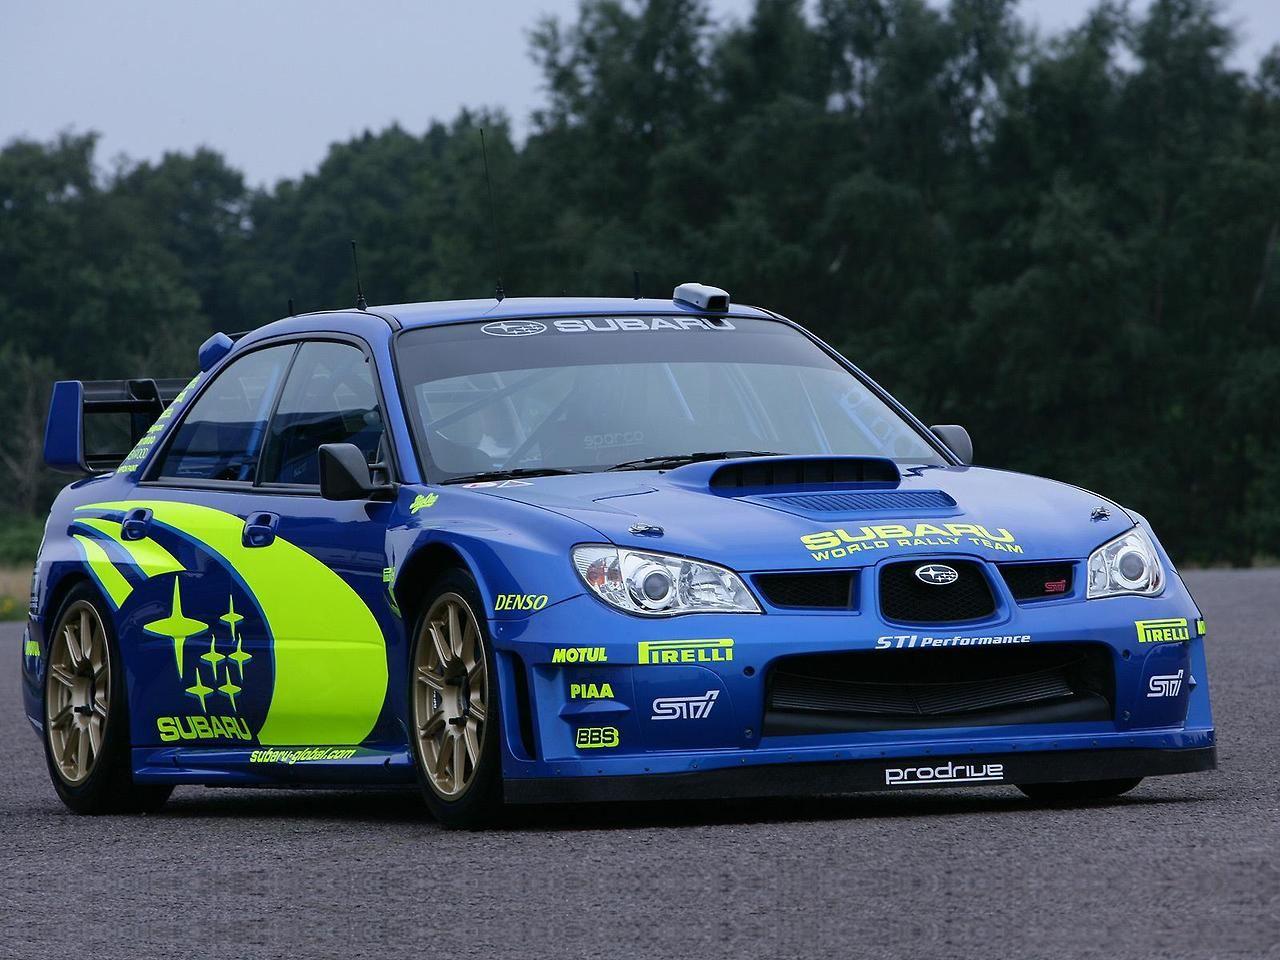 Subaru Rally Car >> Subaru Impreza Wrc Rally Car Subaru Wrx Sti Subaru Wrx Subaru